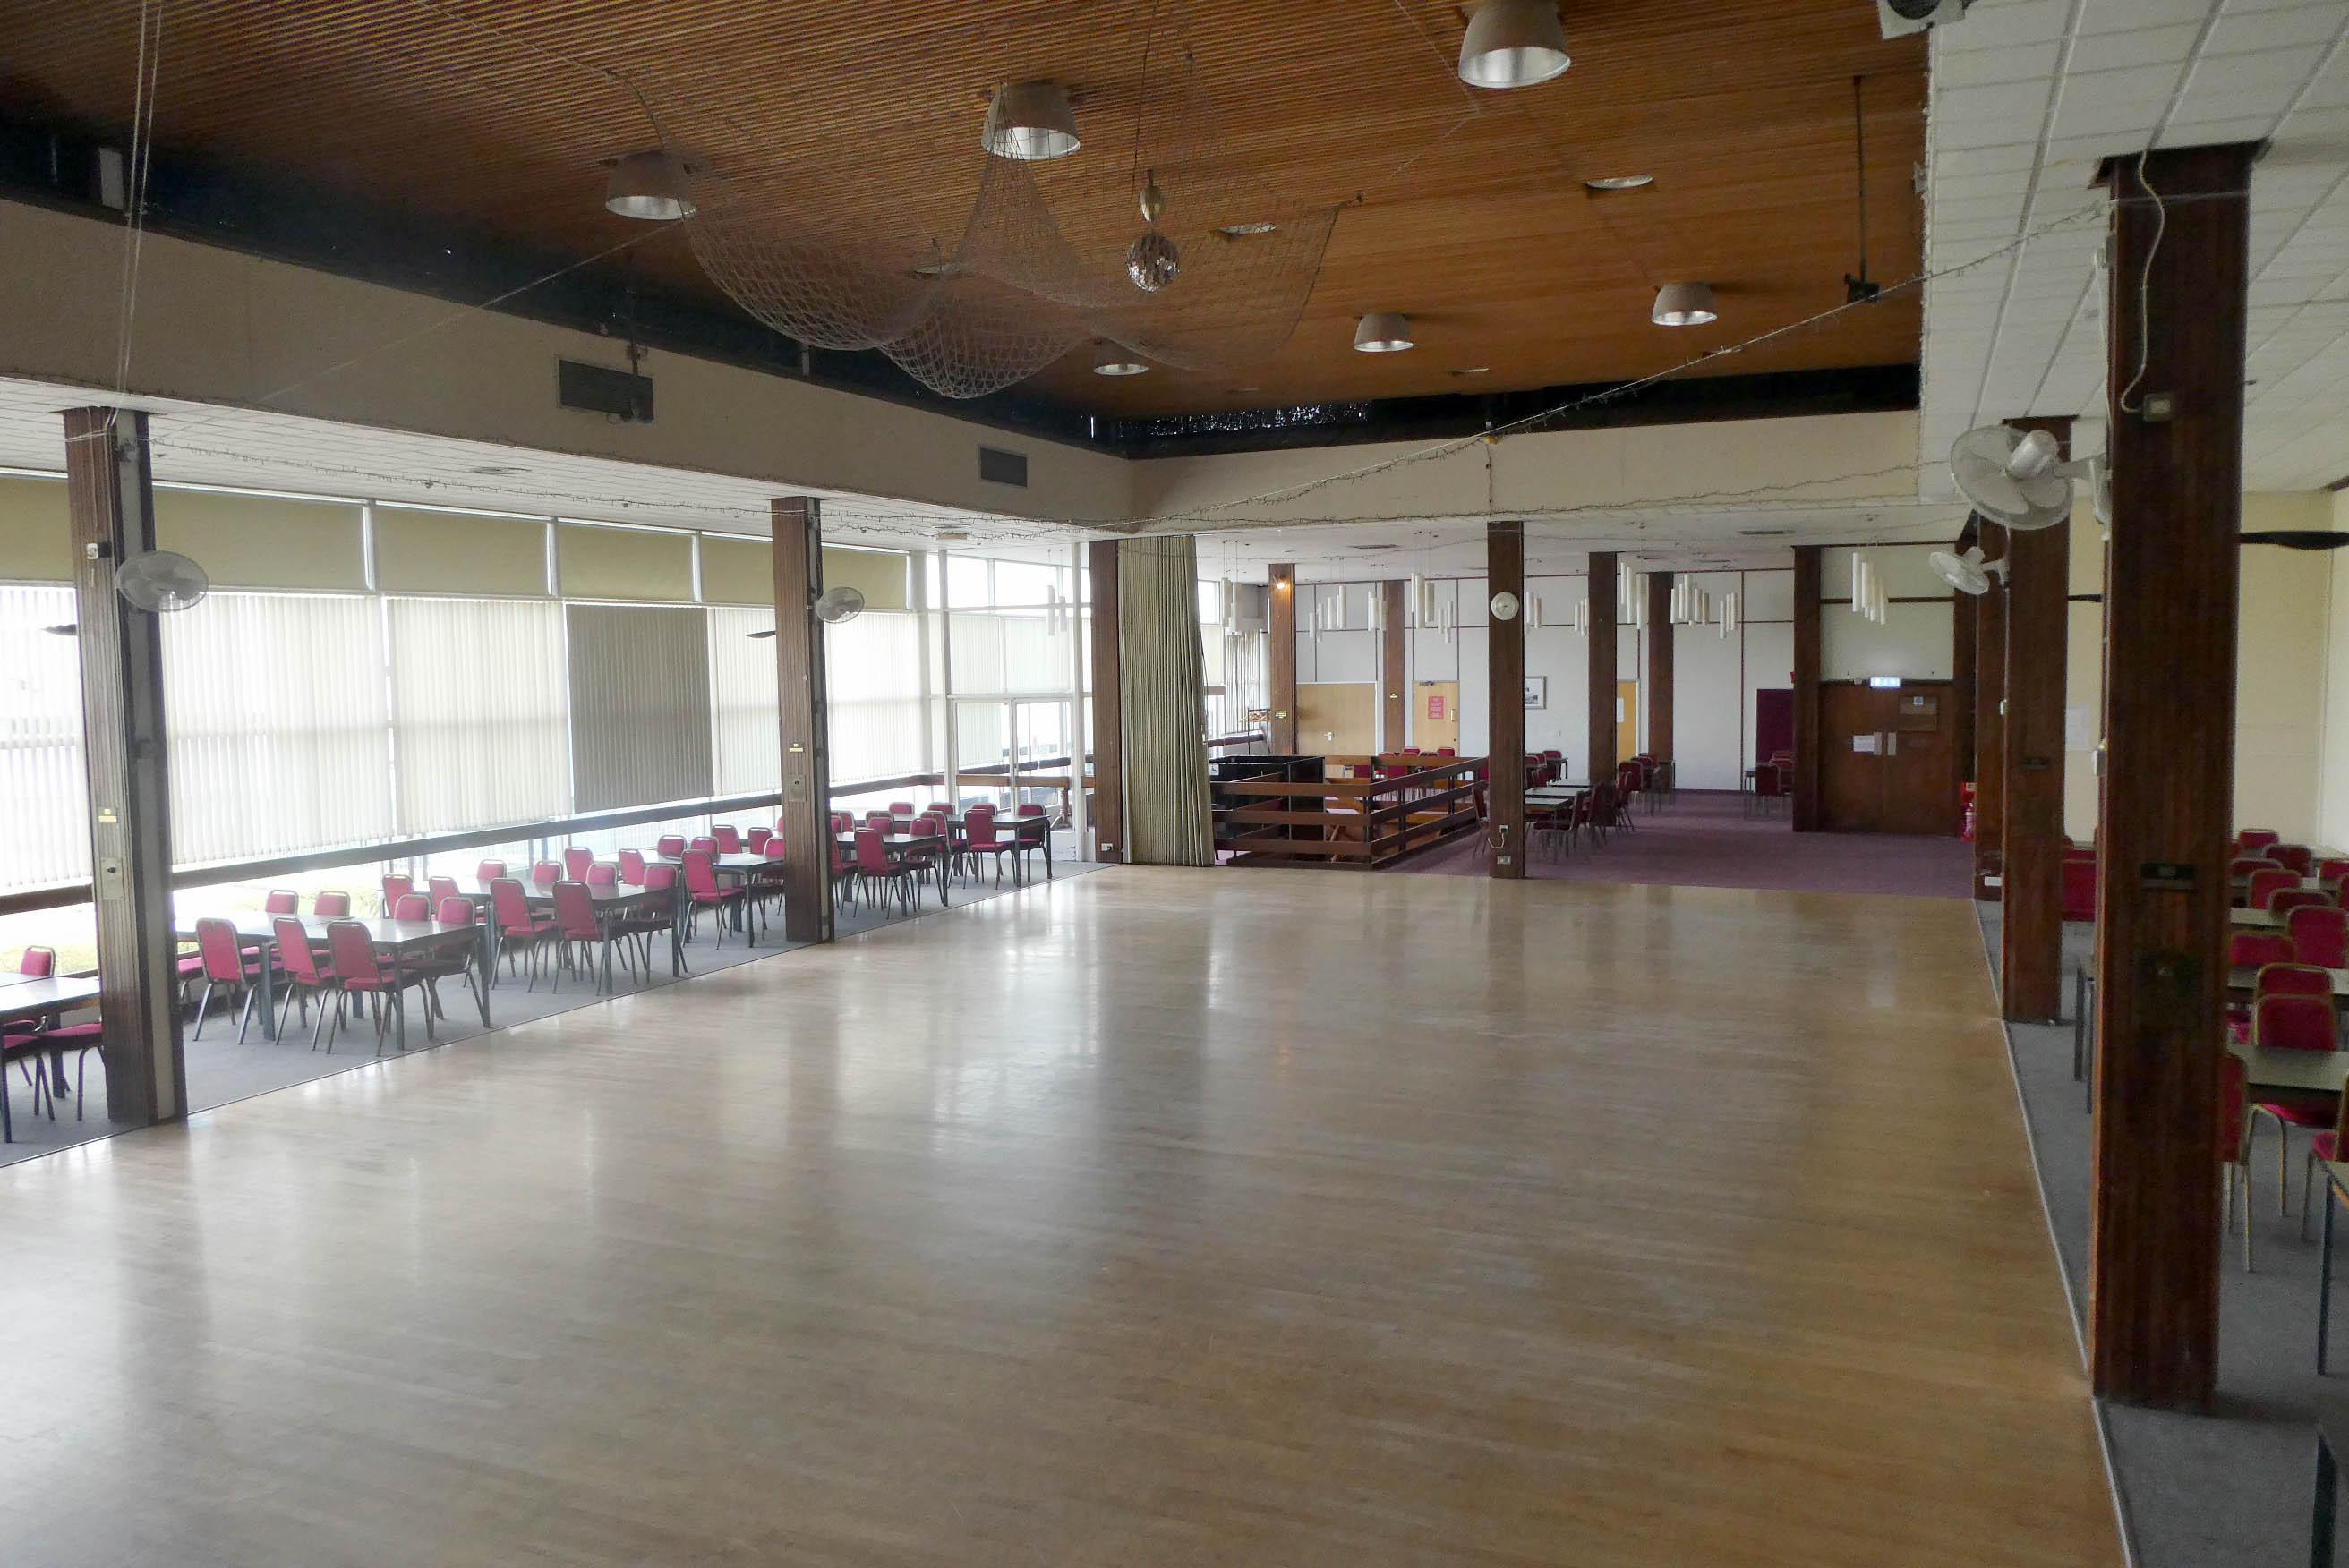 delphi centre sudbury ballroom